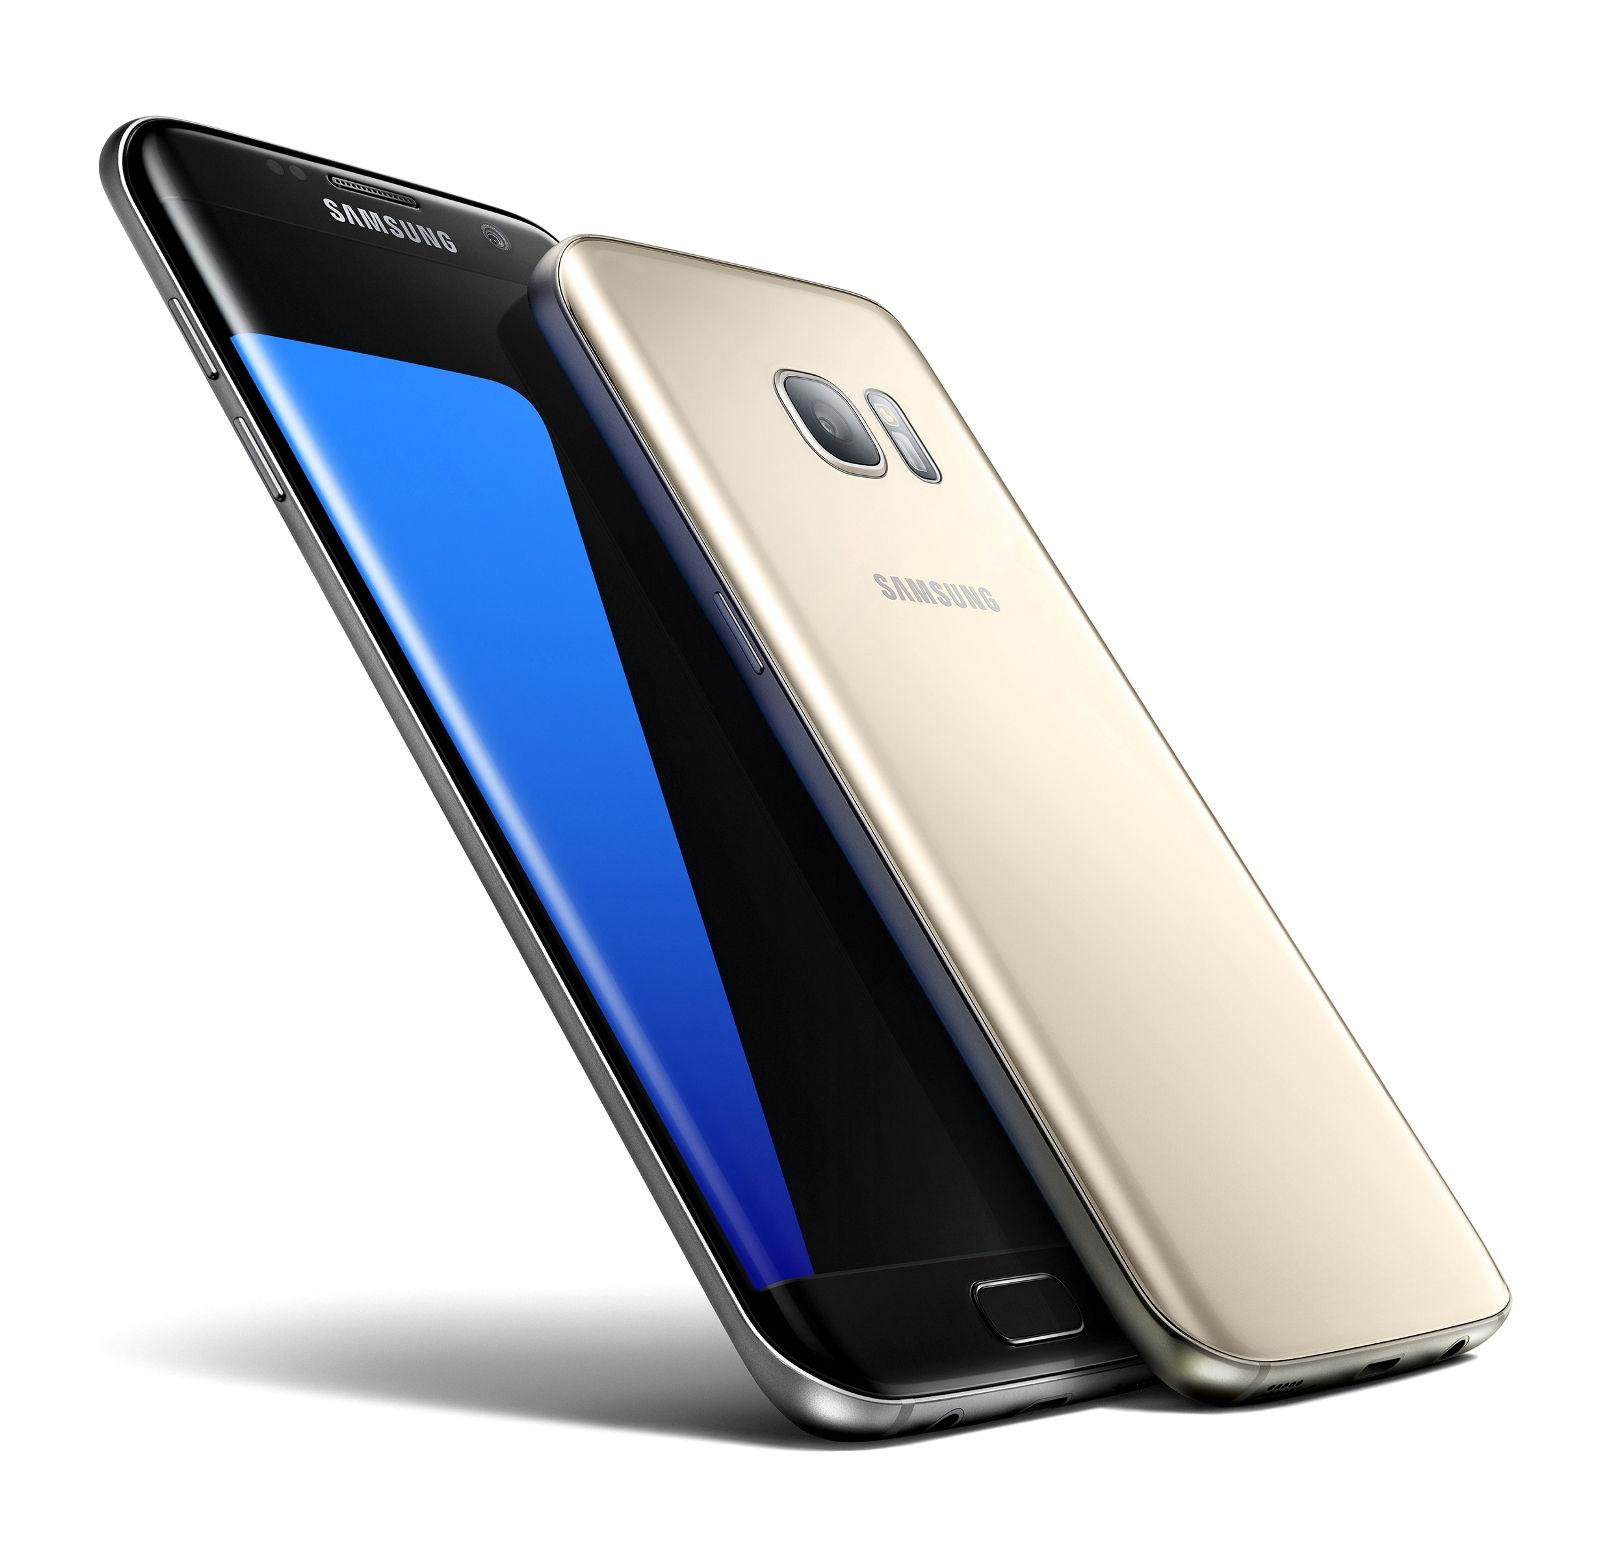 http://www.telefonguru.hu/images/content/Samsung_Galaxy_S7_S7edge.jpg